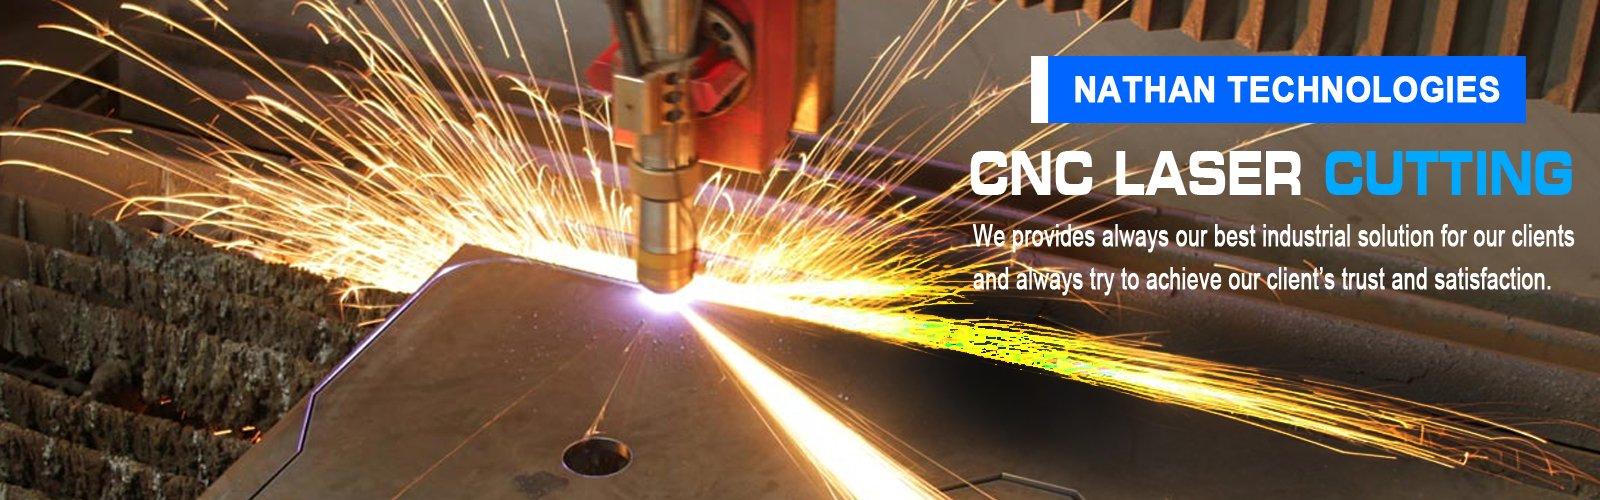 LASER CUTTING JOB WORK IN CHENNAI - NATHAN TECHNOLOGIES